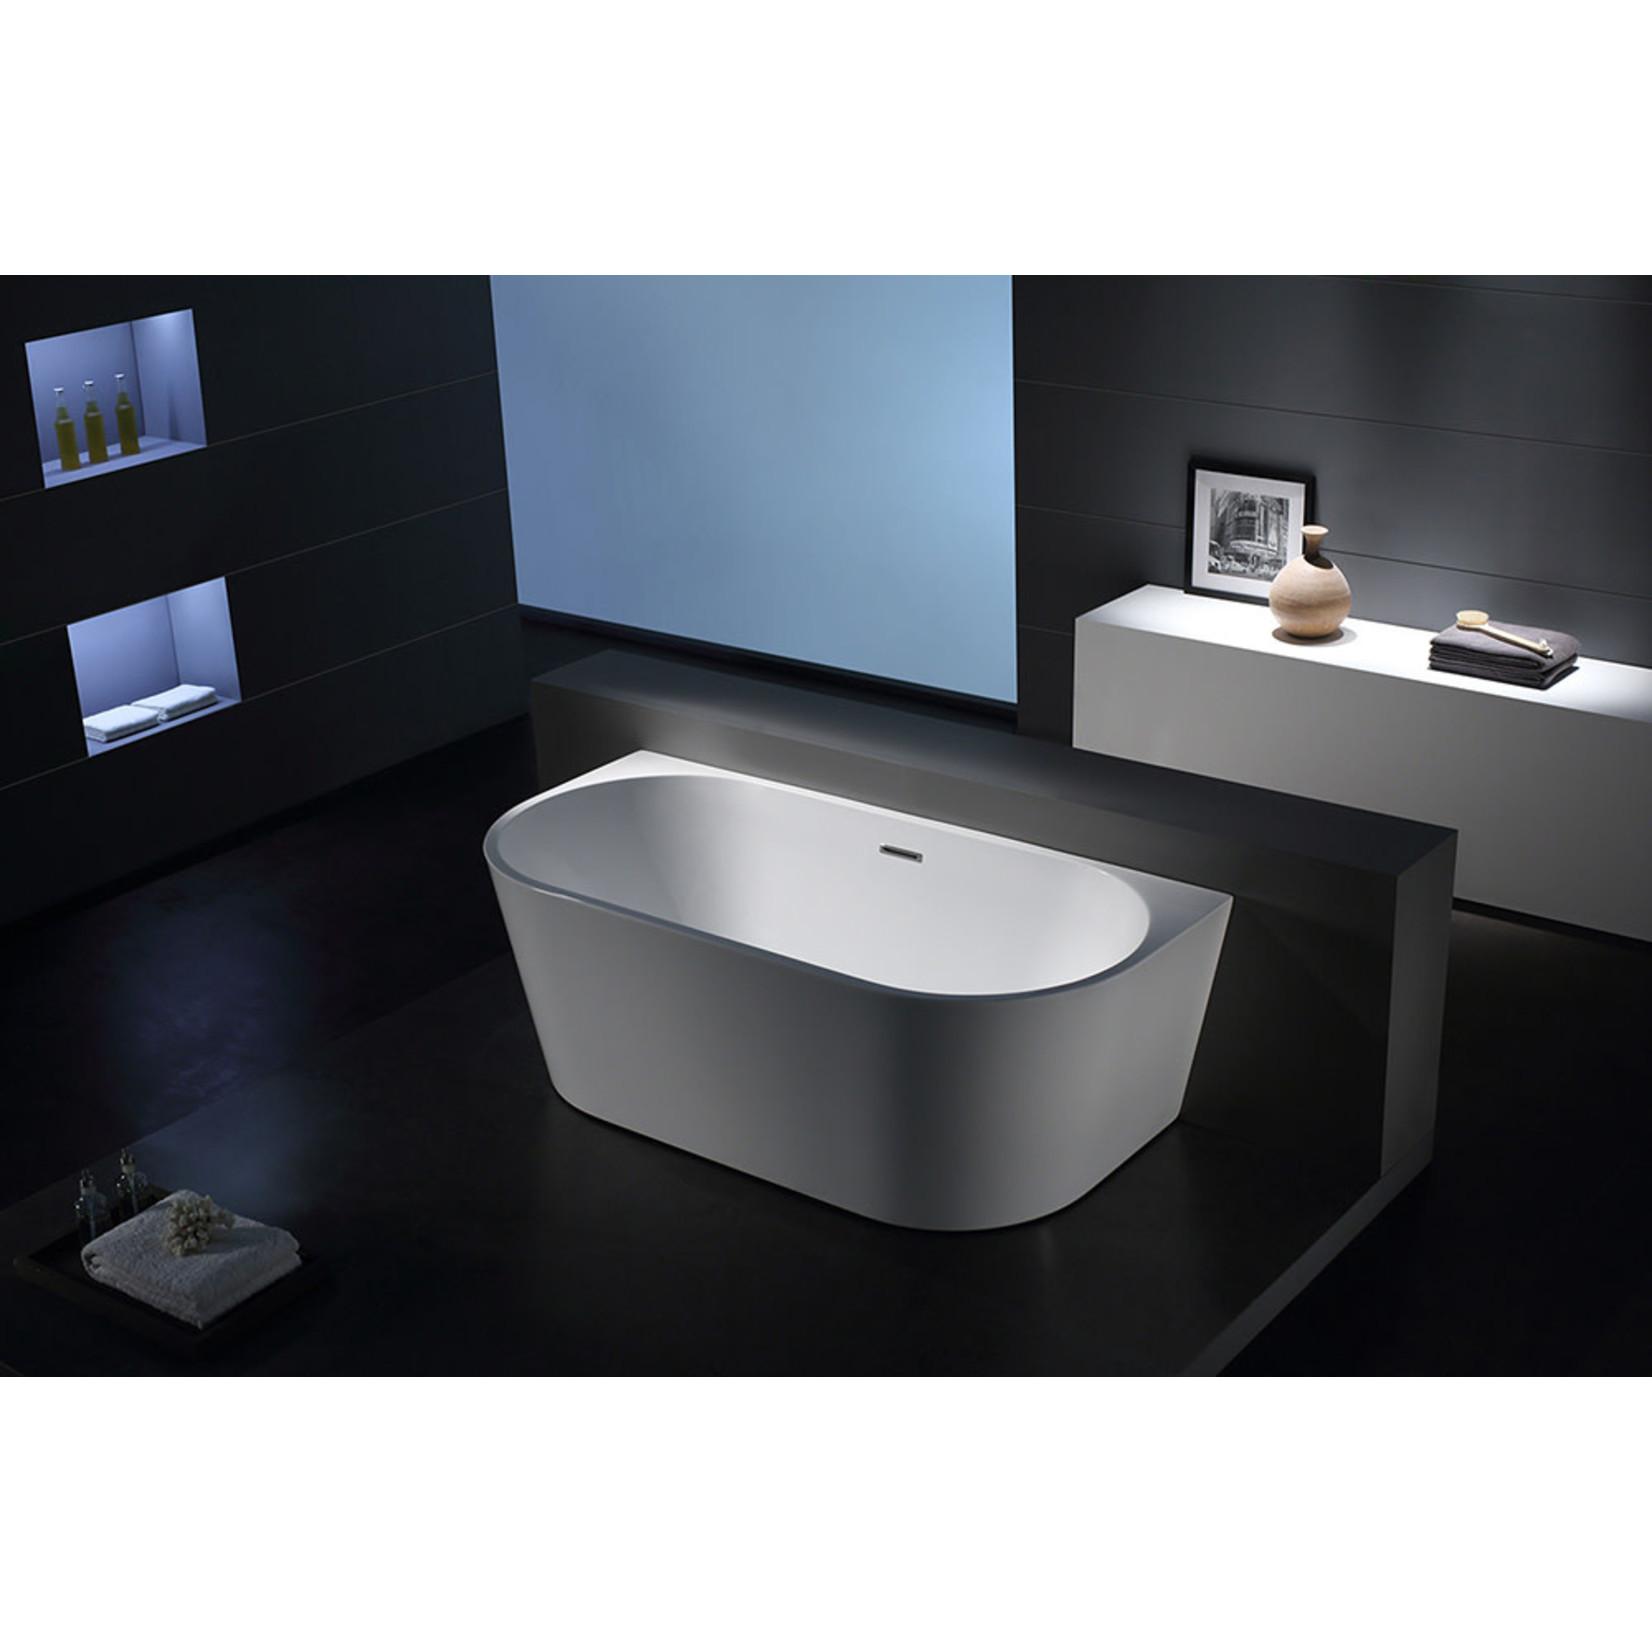 Jade Sao Paolo Freestanding Bathtub